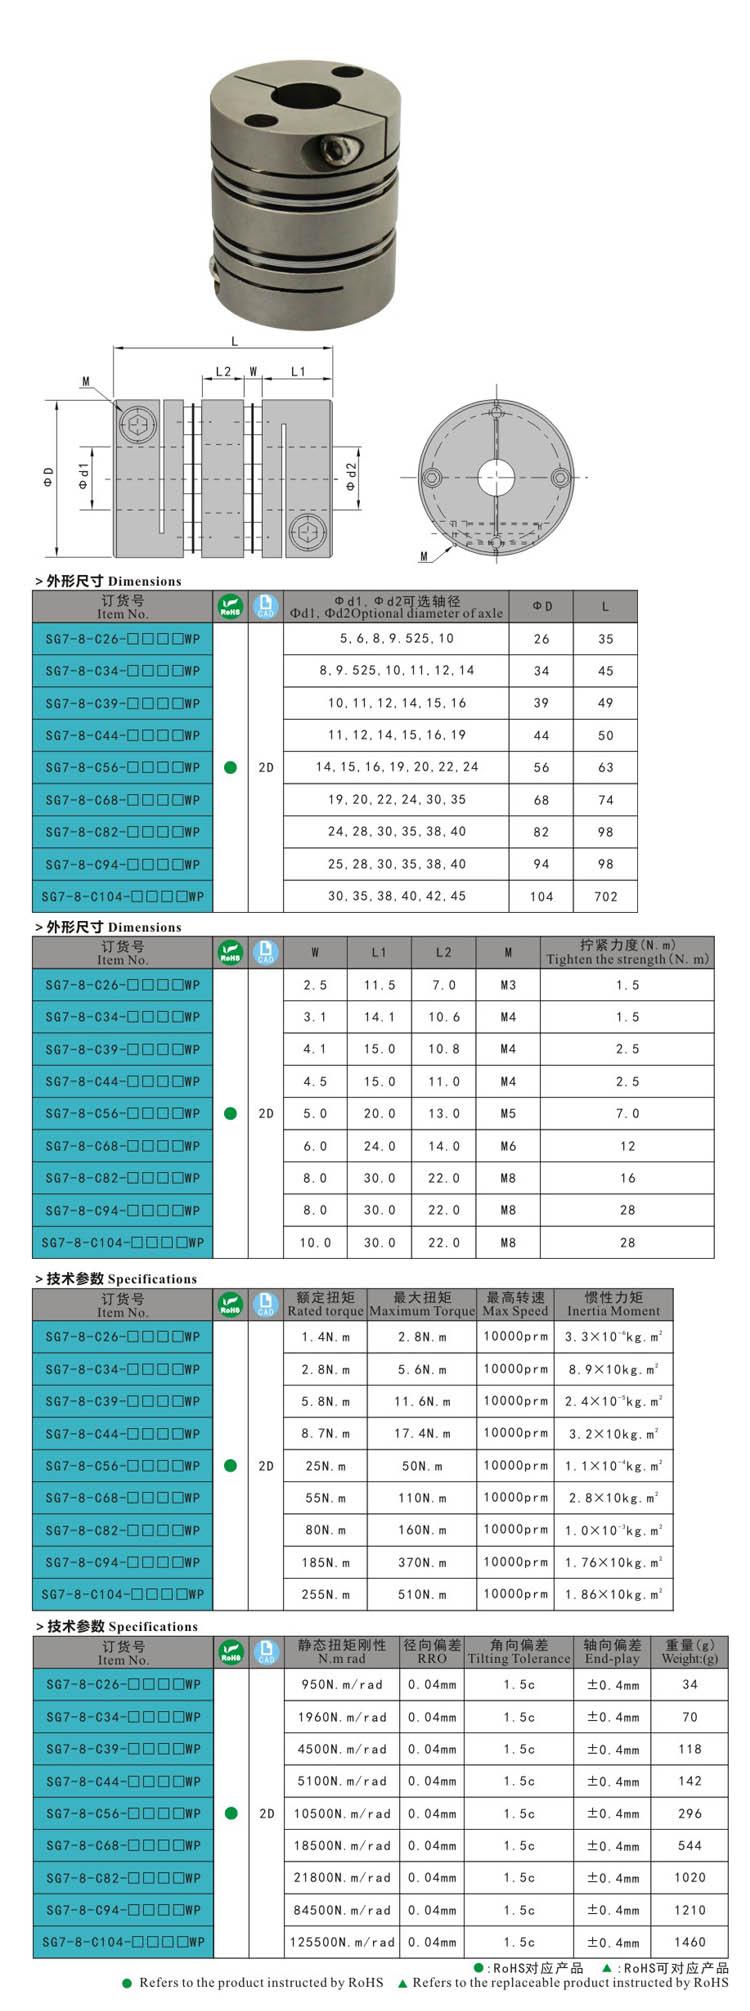 SG7-8-WP尺寸